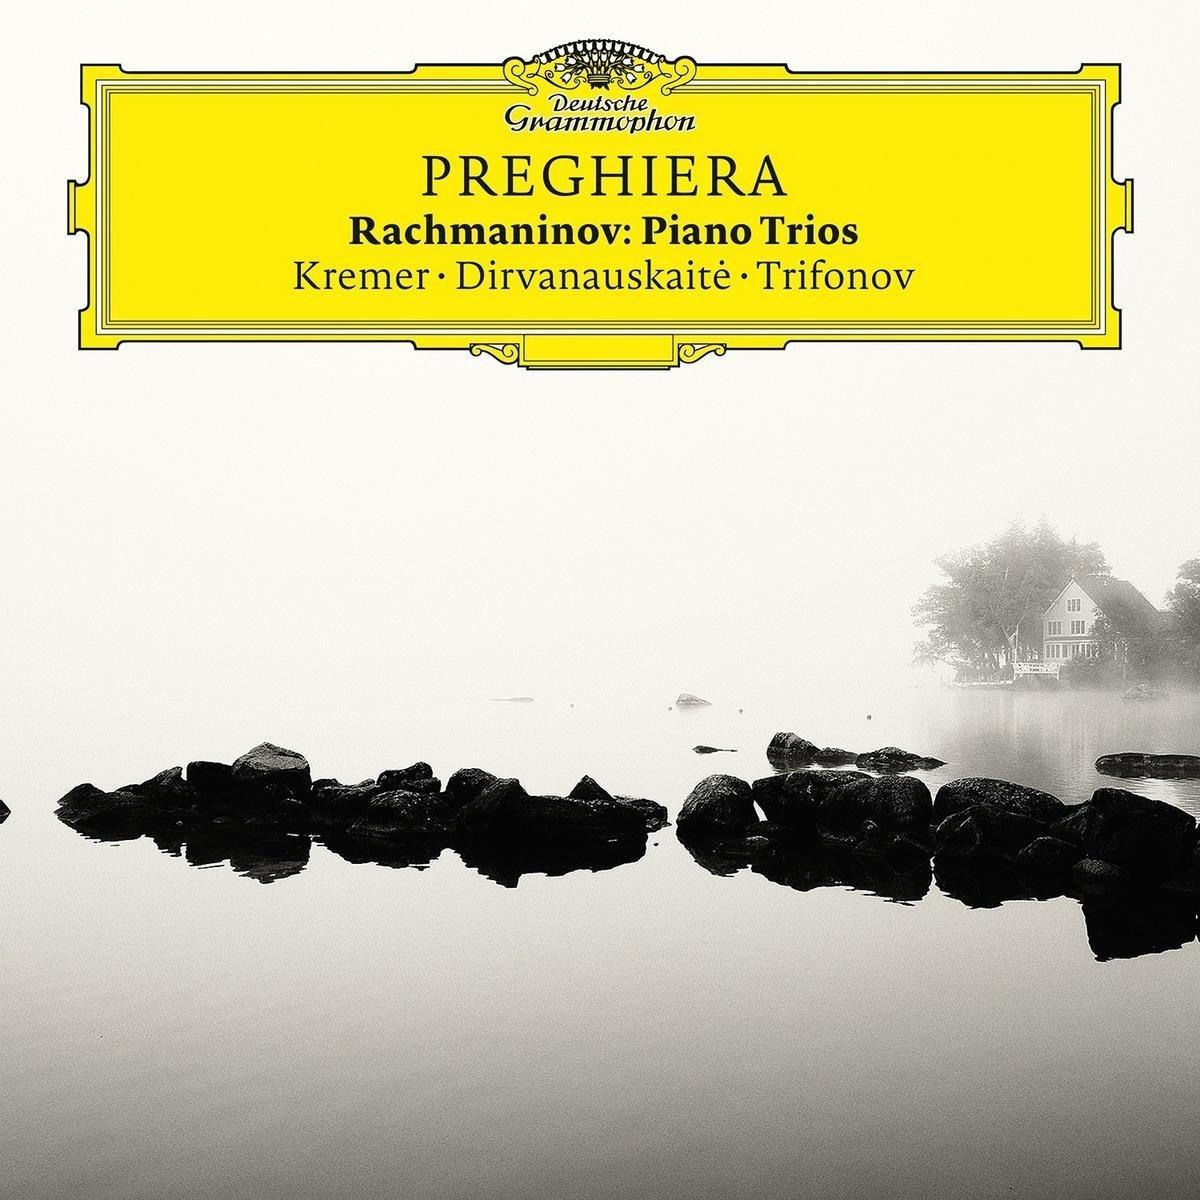 Preghiera - Rachmaninov Piano Trios